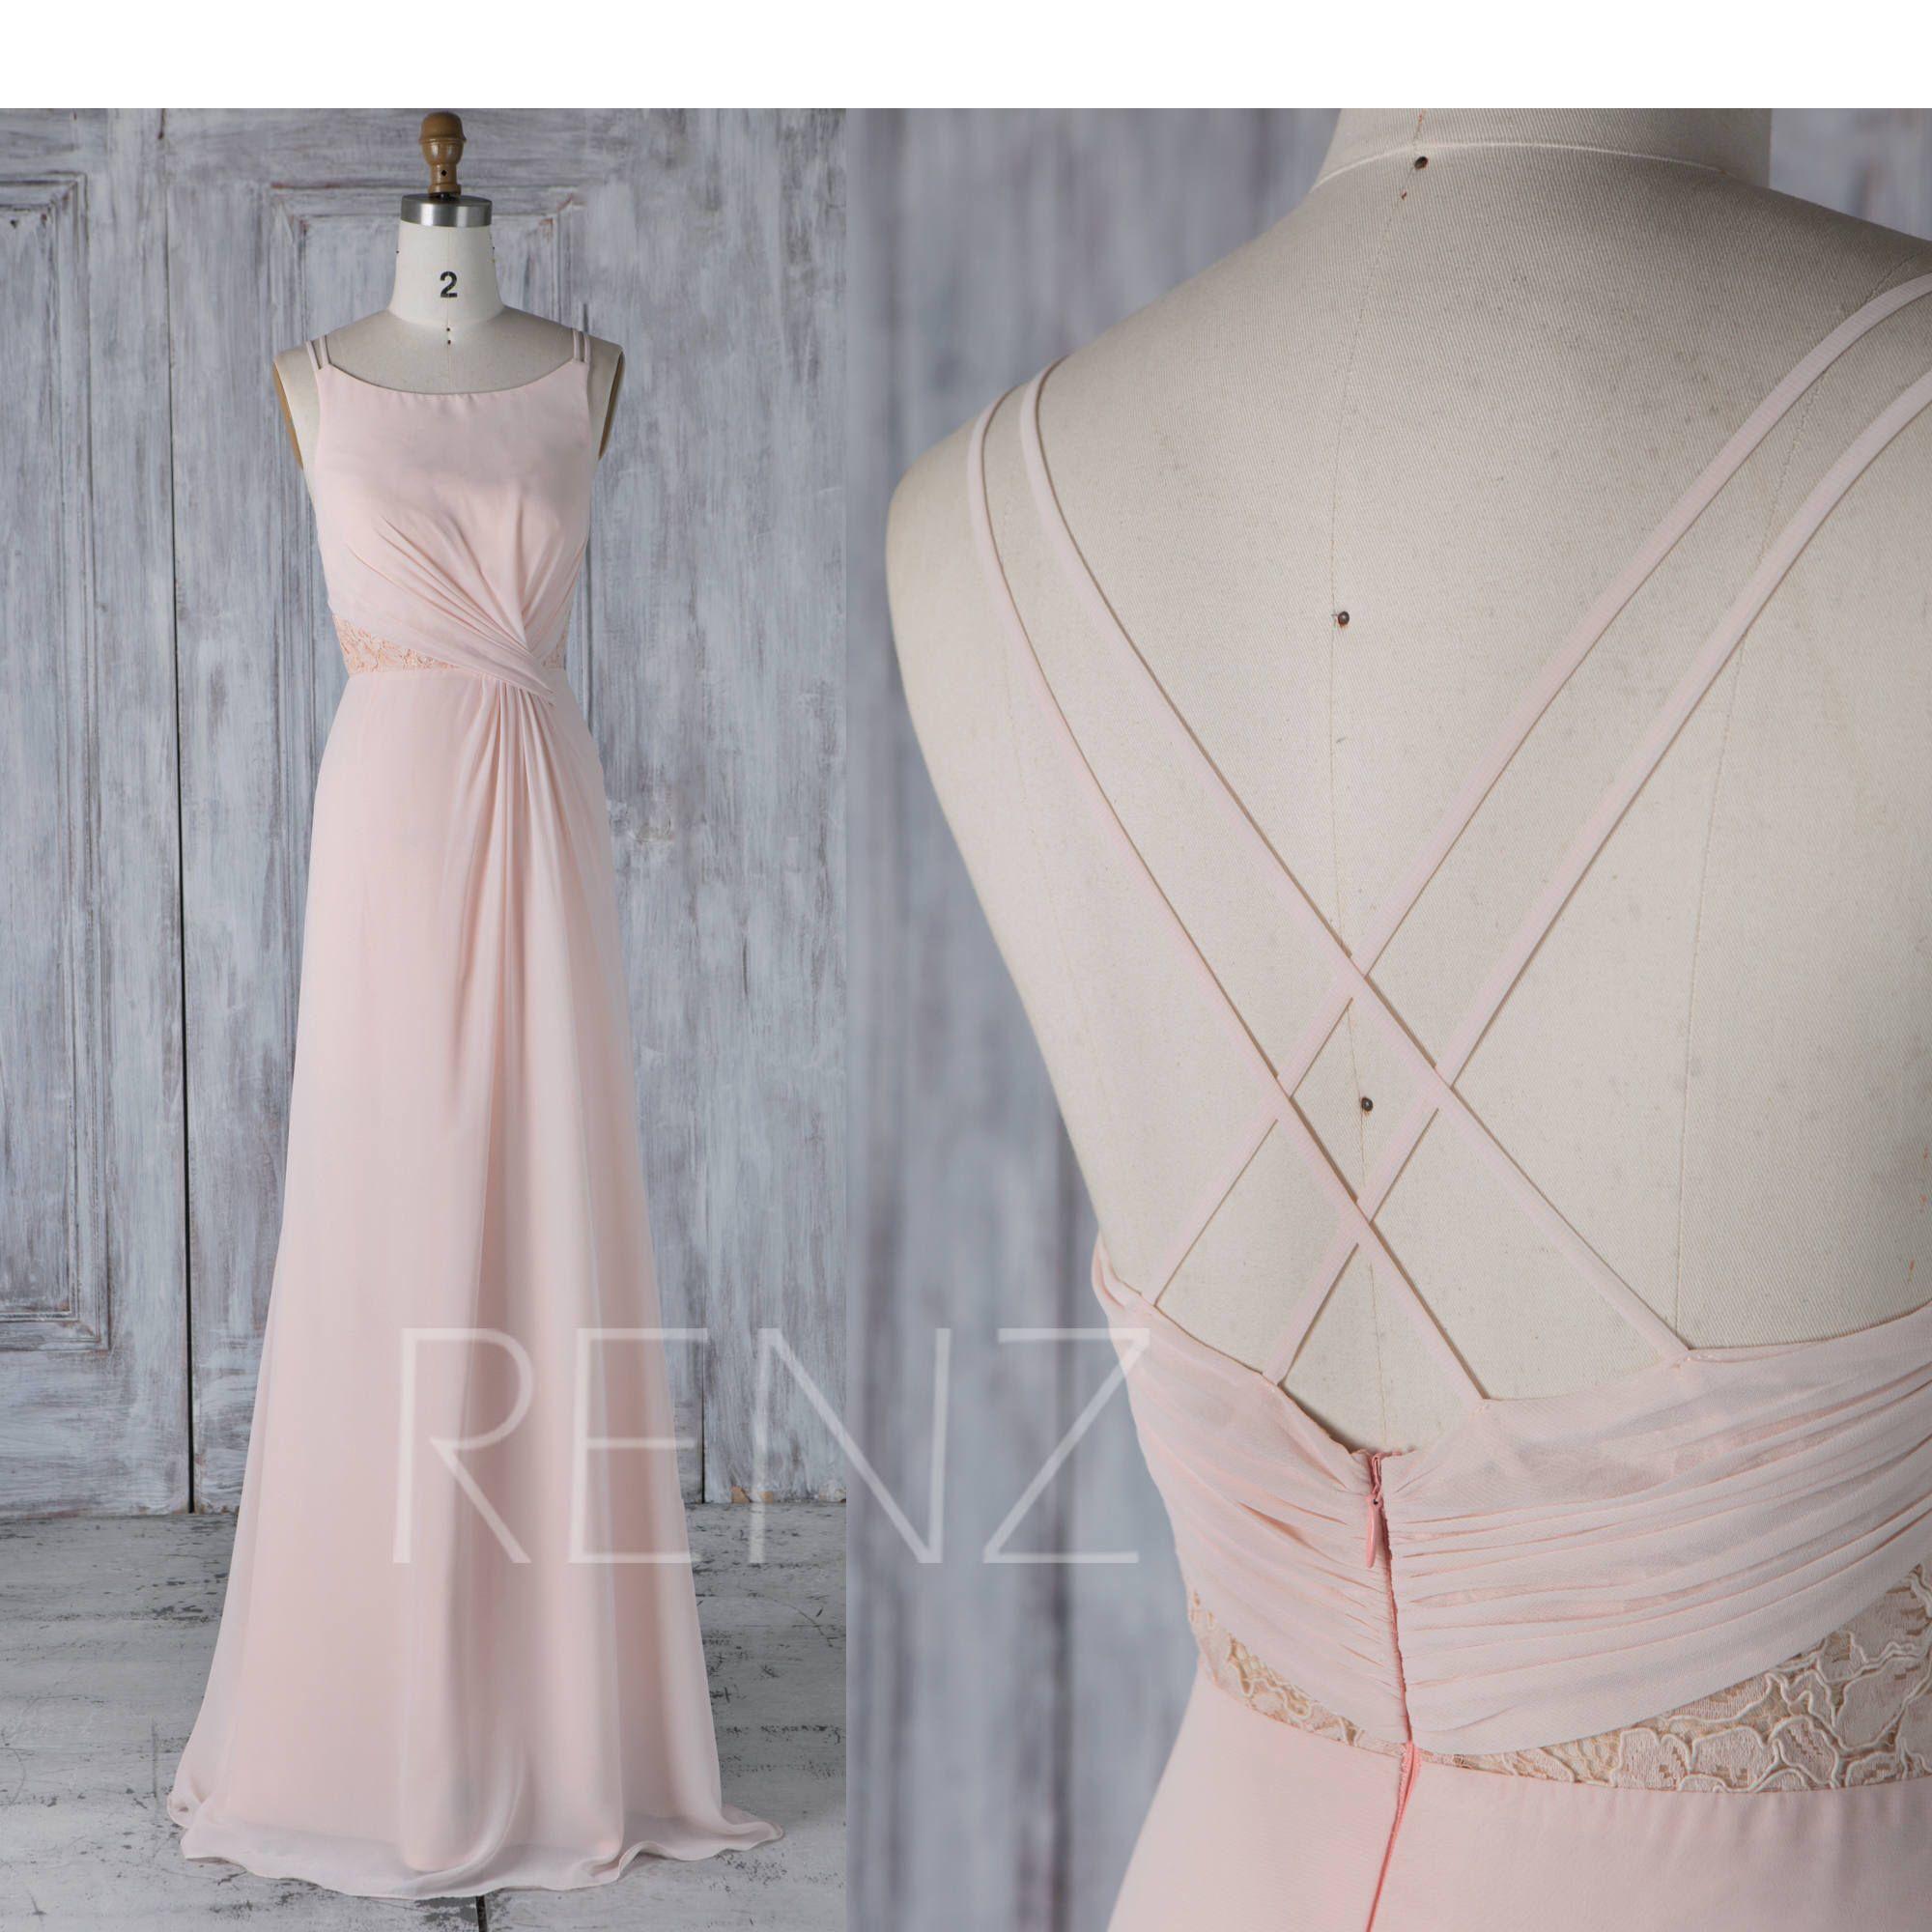 Bridesmaid dress peach chiffon wedding dressboat neck maxi dress